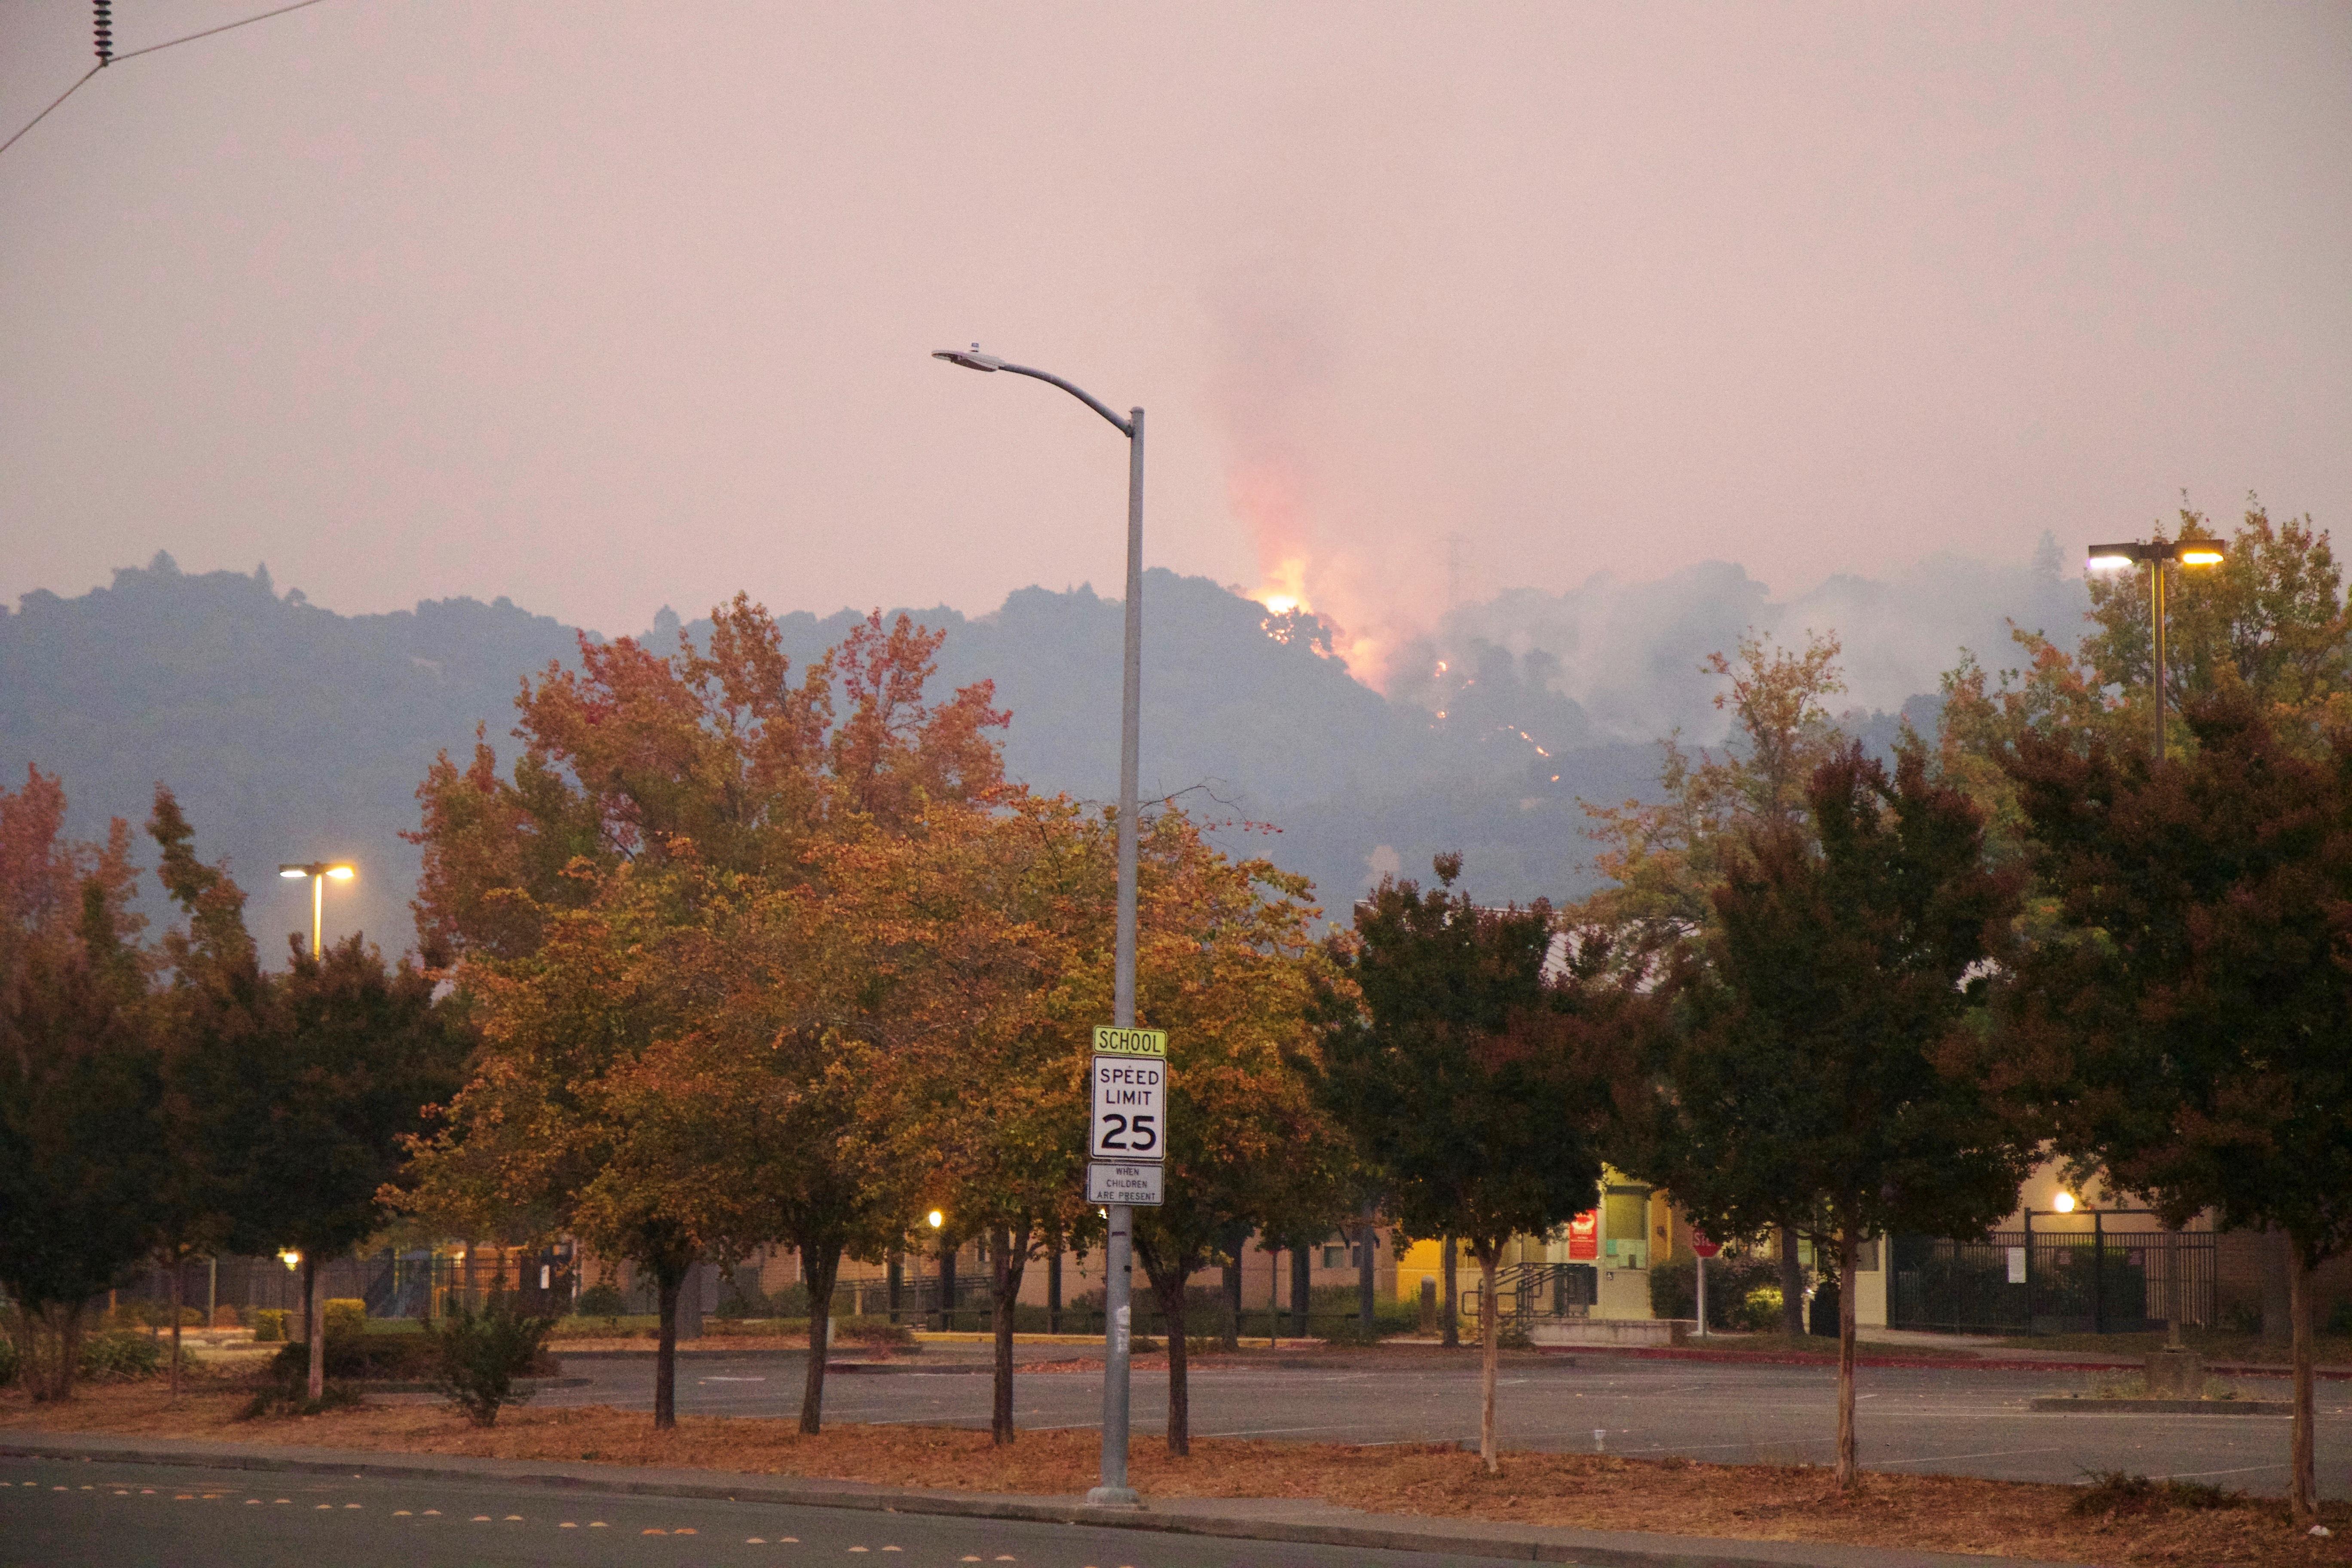 Fire on a mountain overlooking a Santa Rosa street.